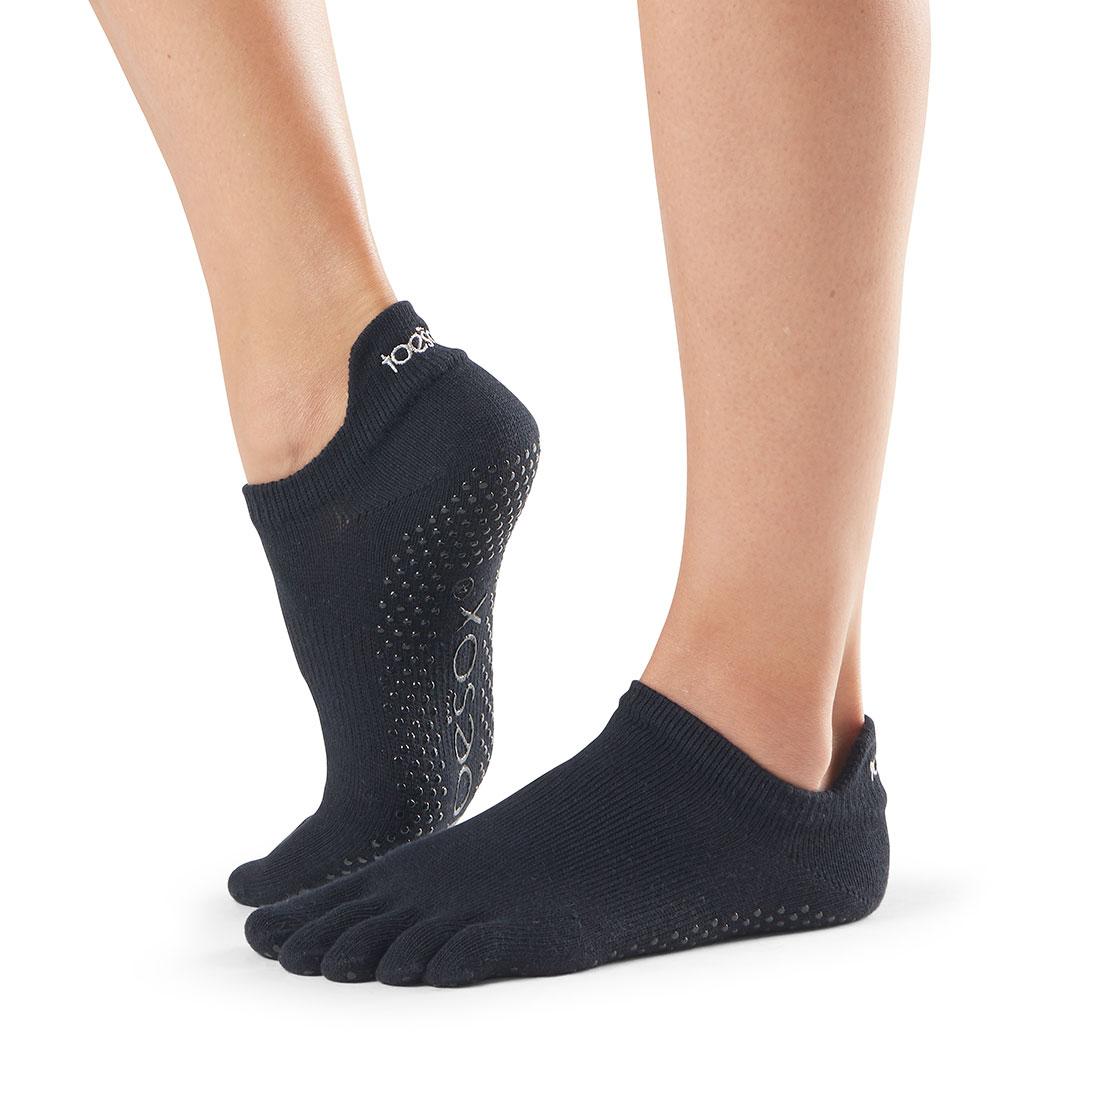 Yogasocken ToeSox Low Rise Full Toe Black